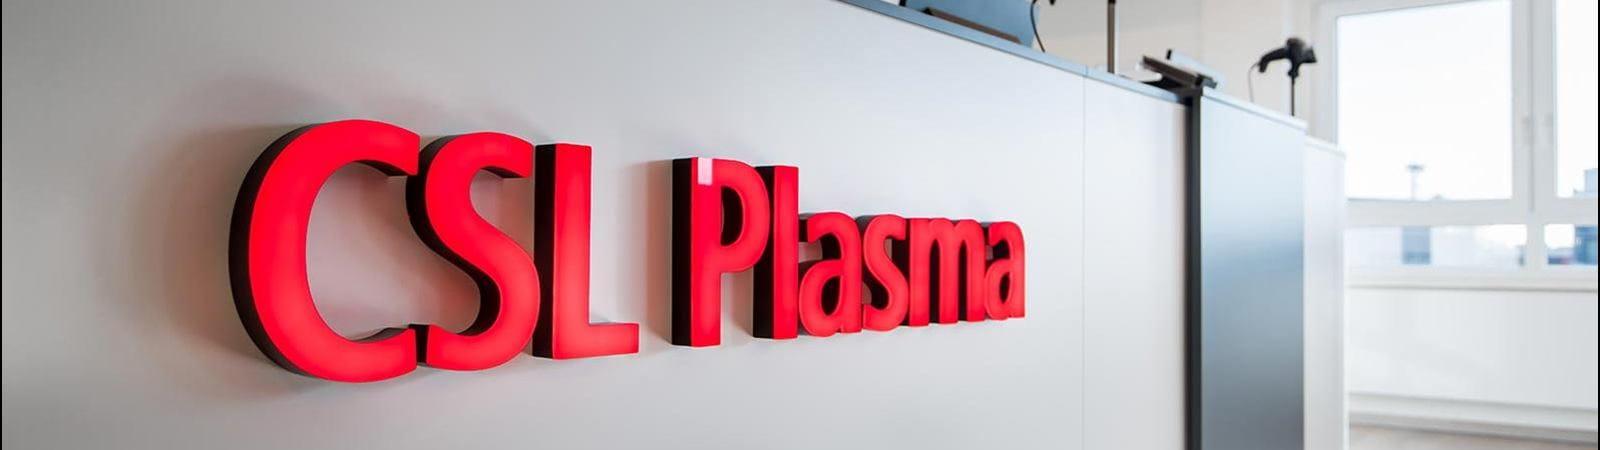 CSL Plasma collection center lobby